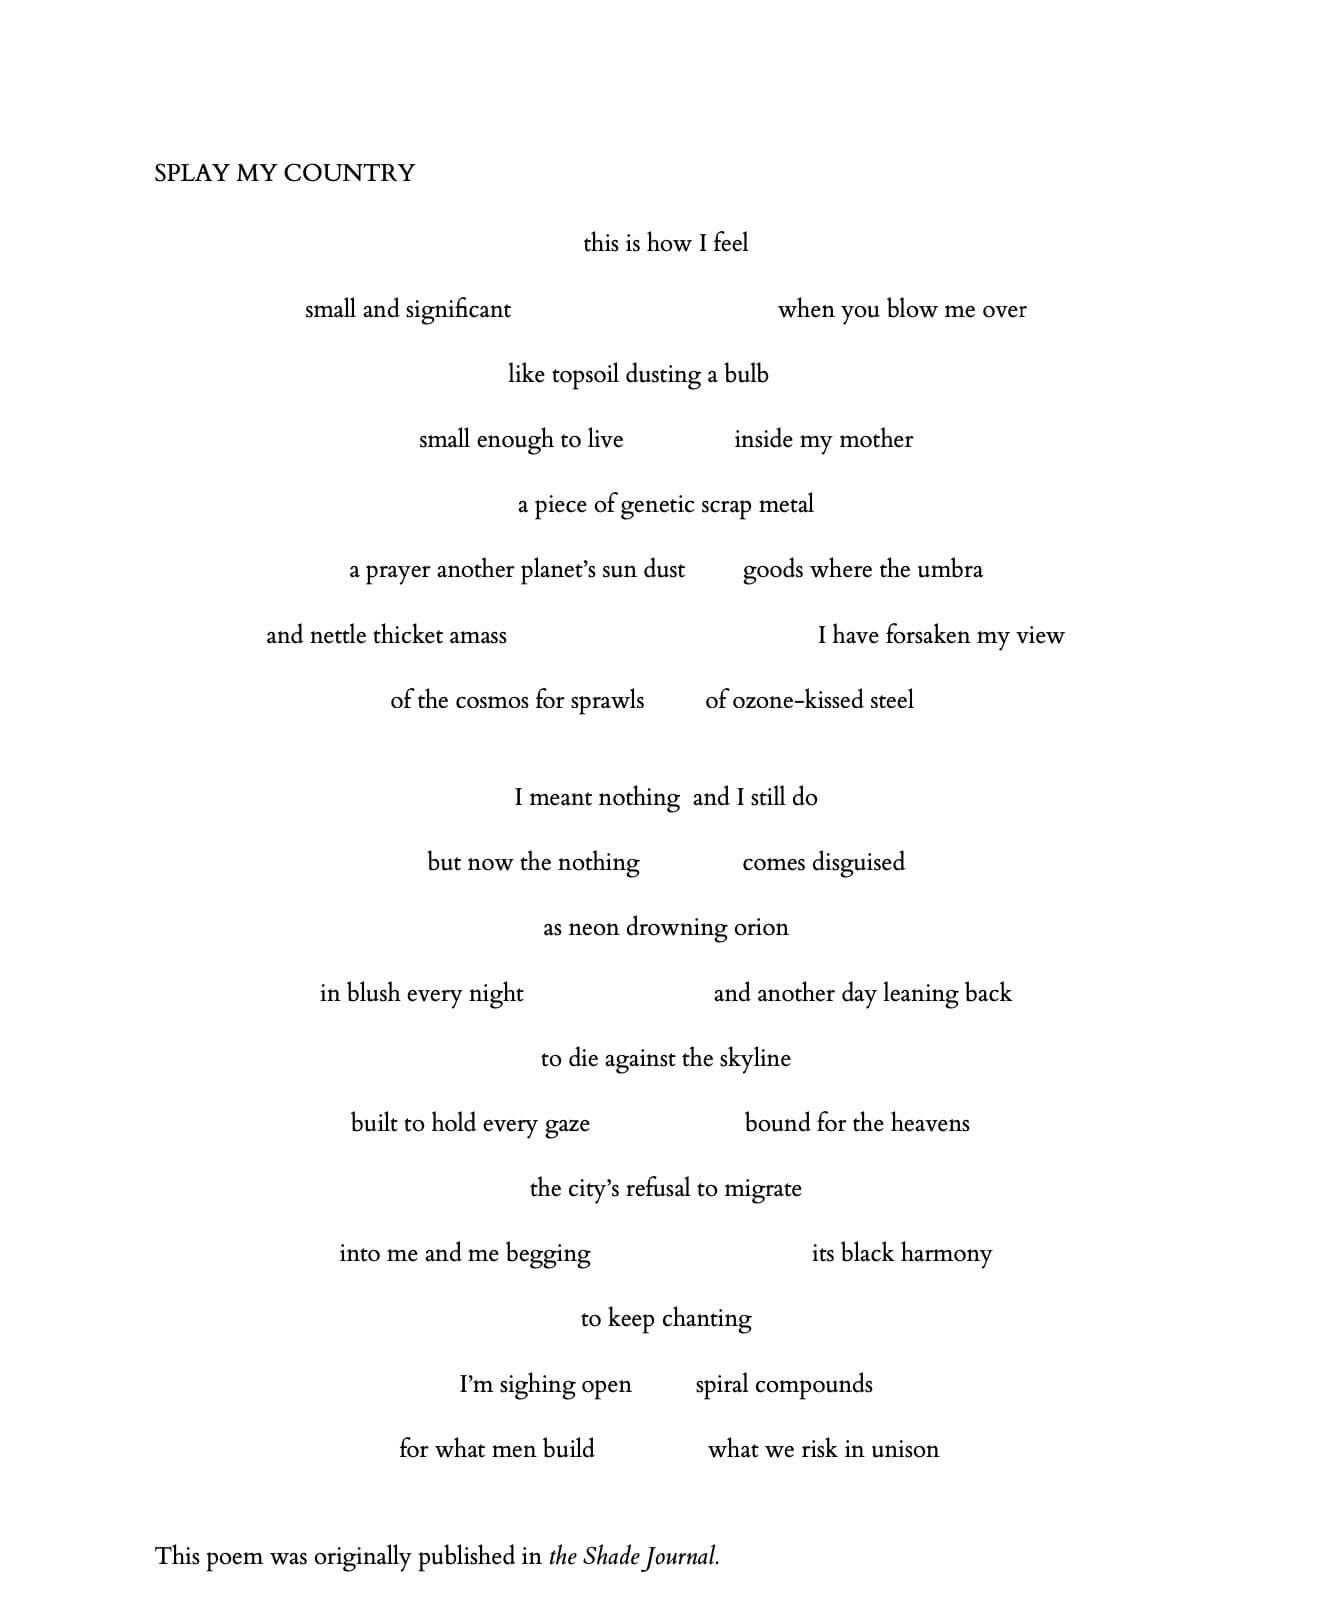 Poem: SPLAY MY COUNTRY - Xandria Phillips